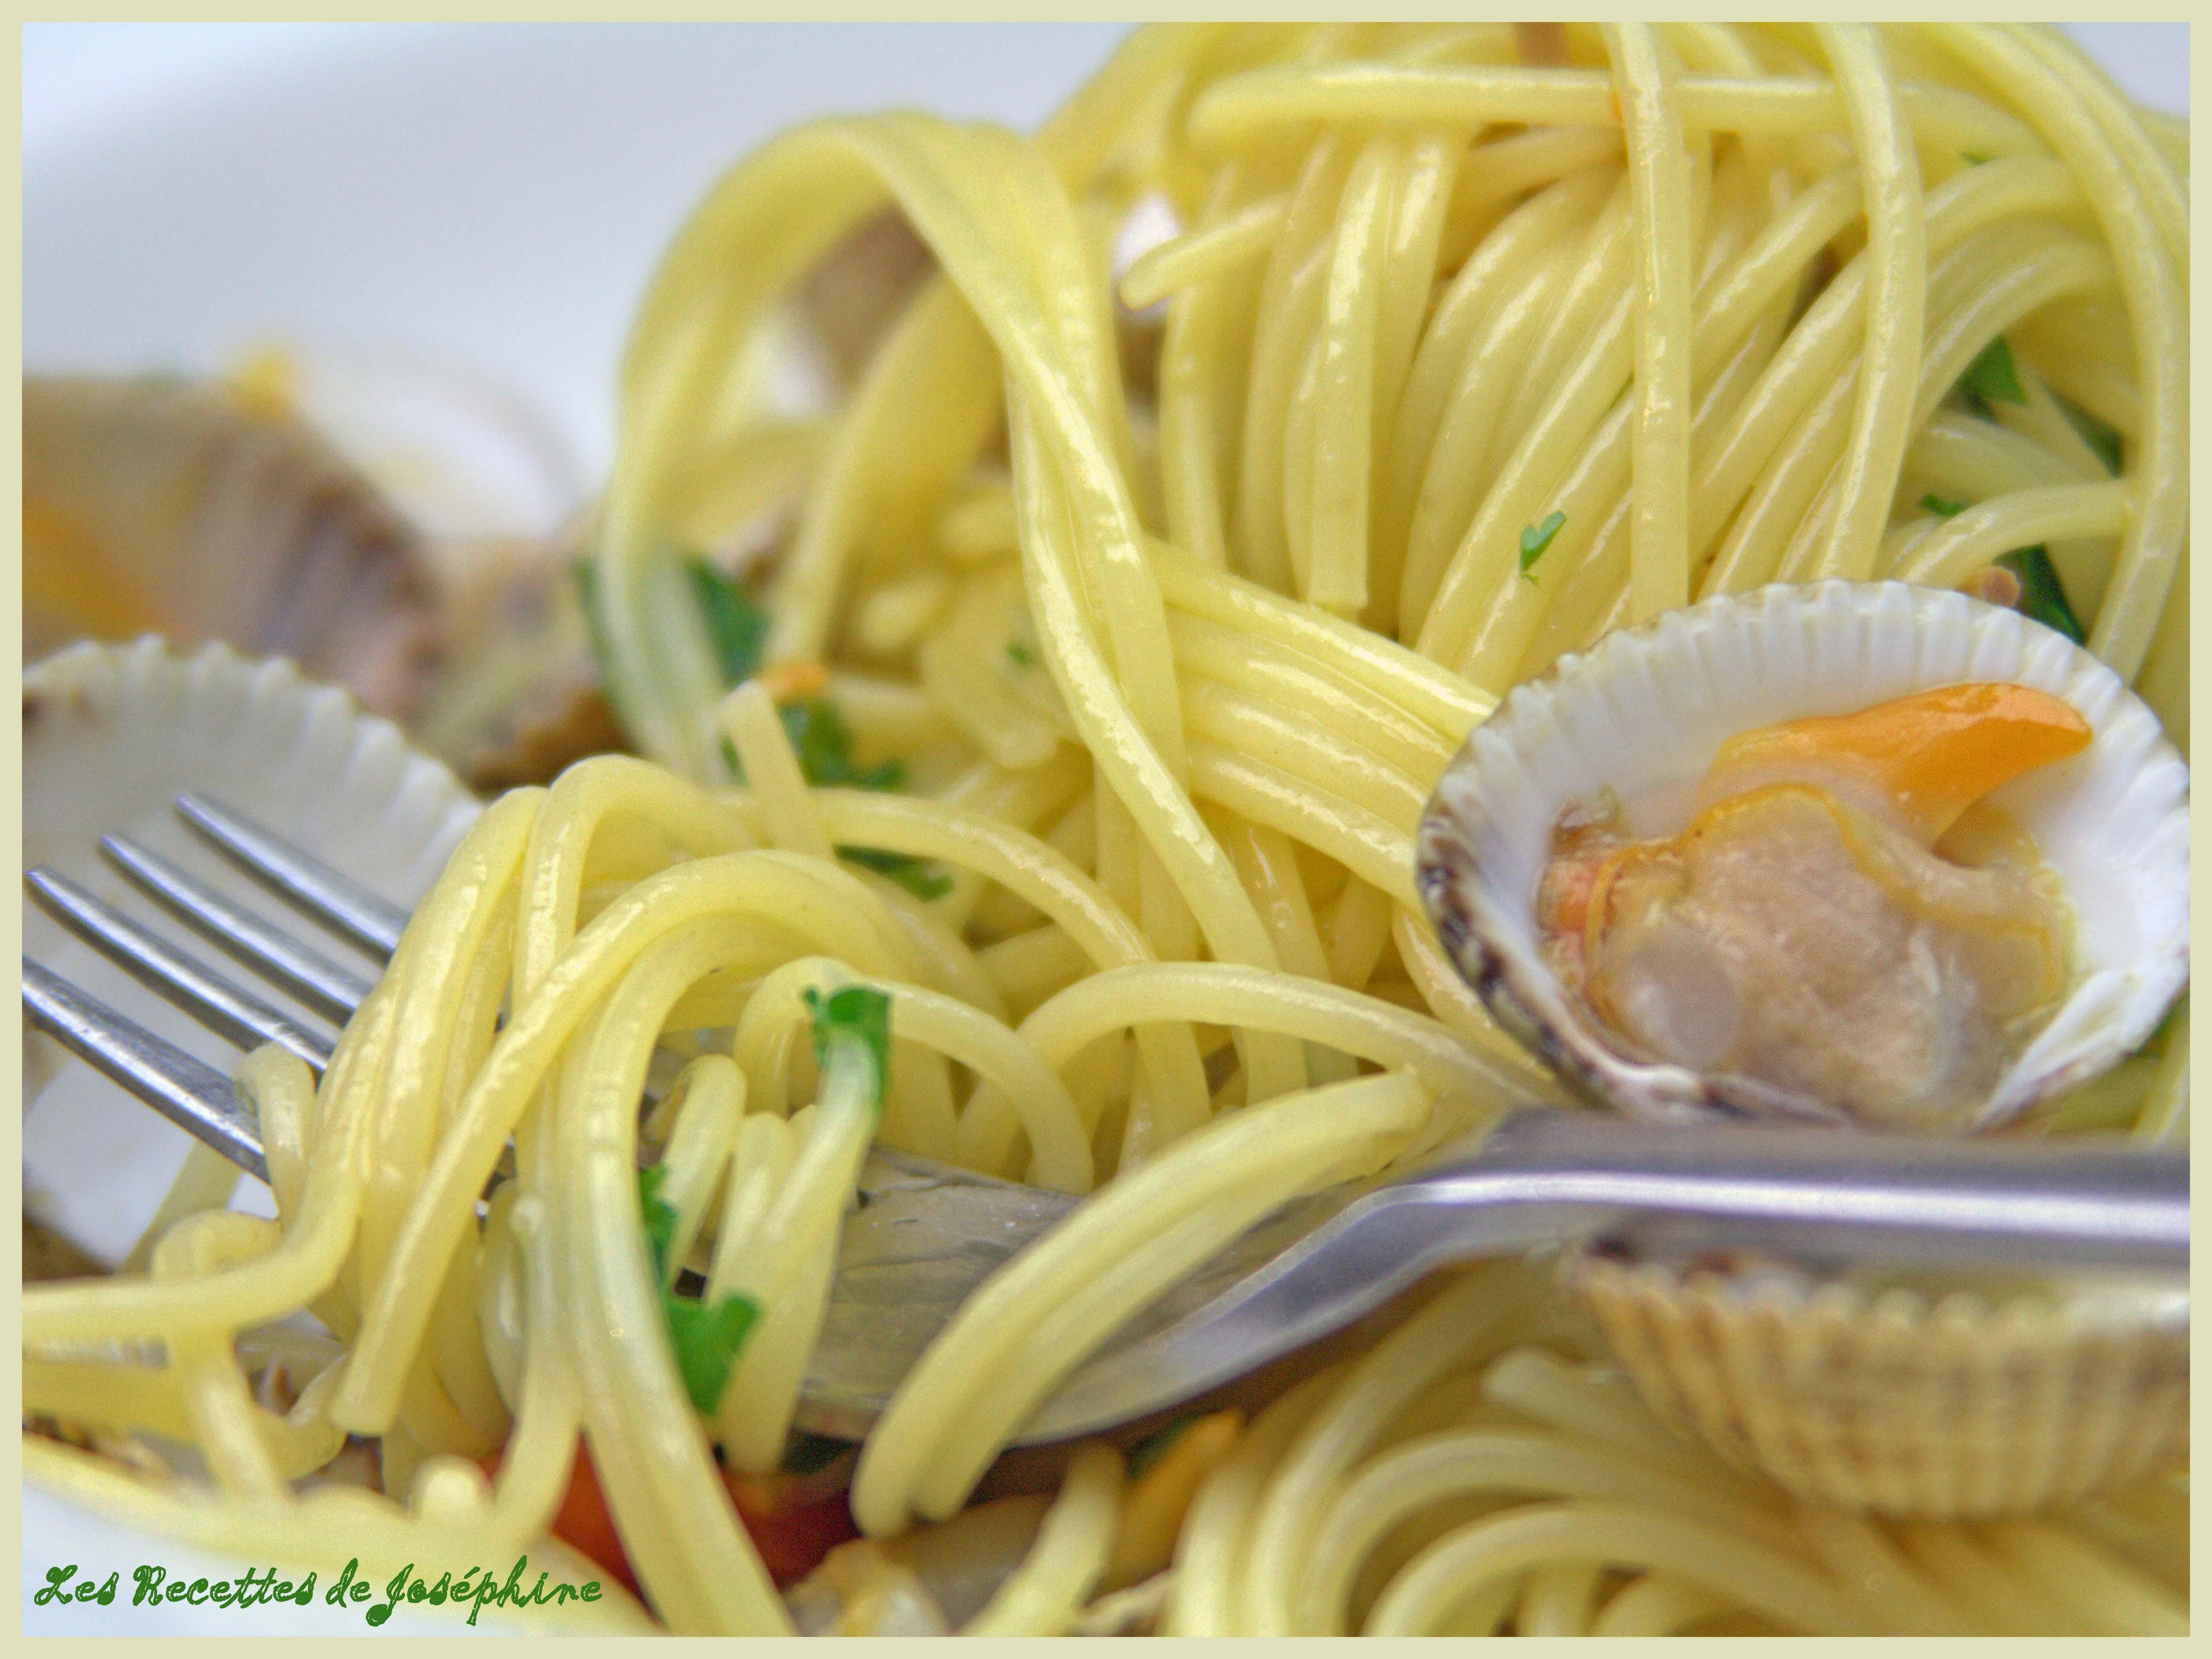 josephine bakers spaghetti bolognaise - photo #23